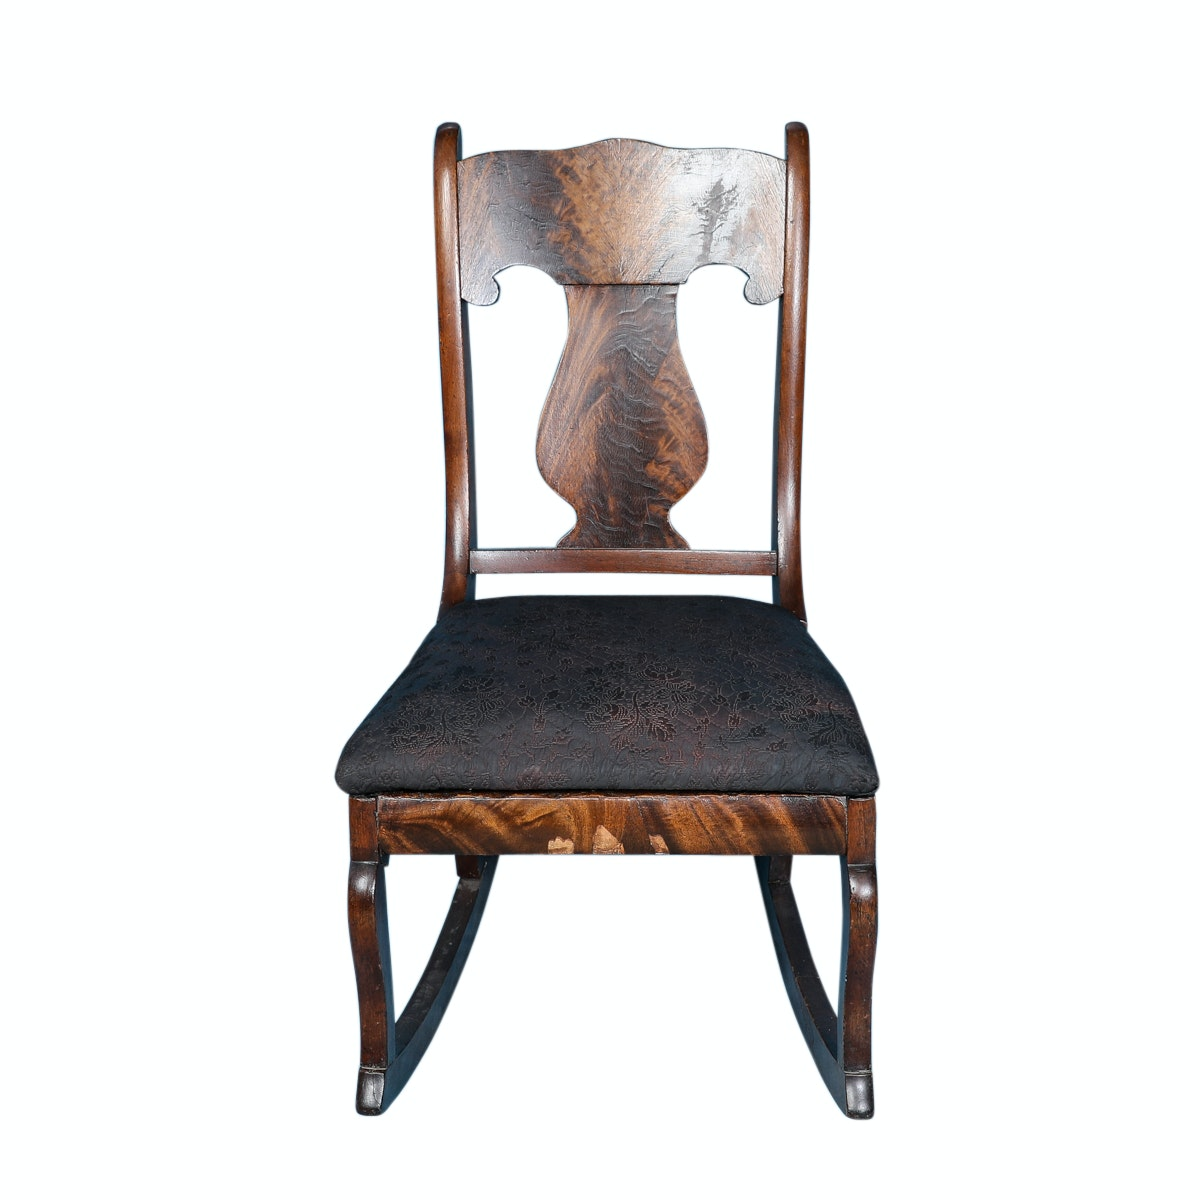 Antique Queen Anne Style Rocking Chair ...  sc 1 st  EBTH.com & Antique Queen Anne Style Rocking Chair : EBTH